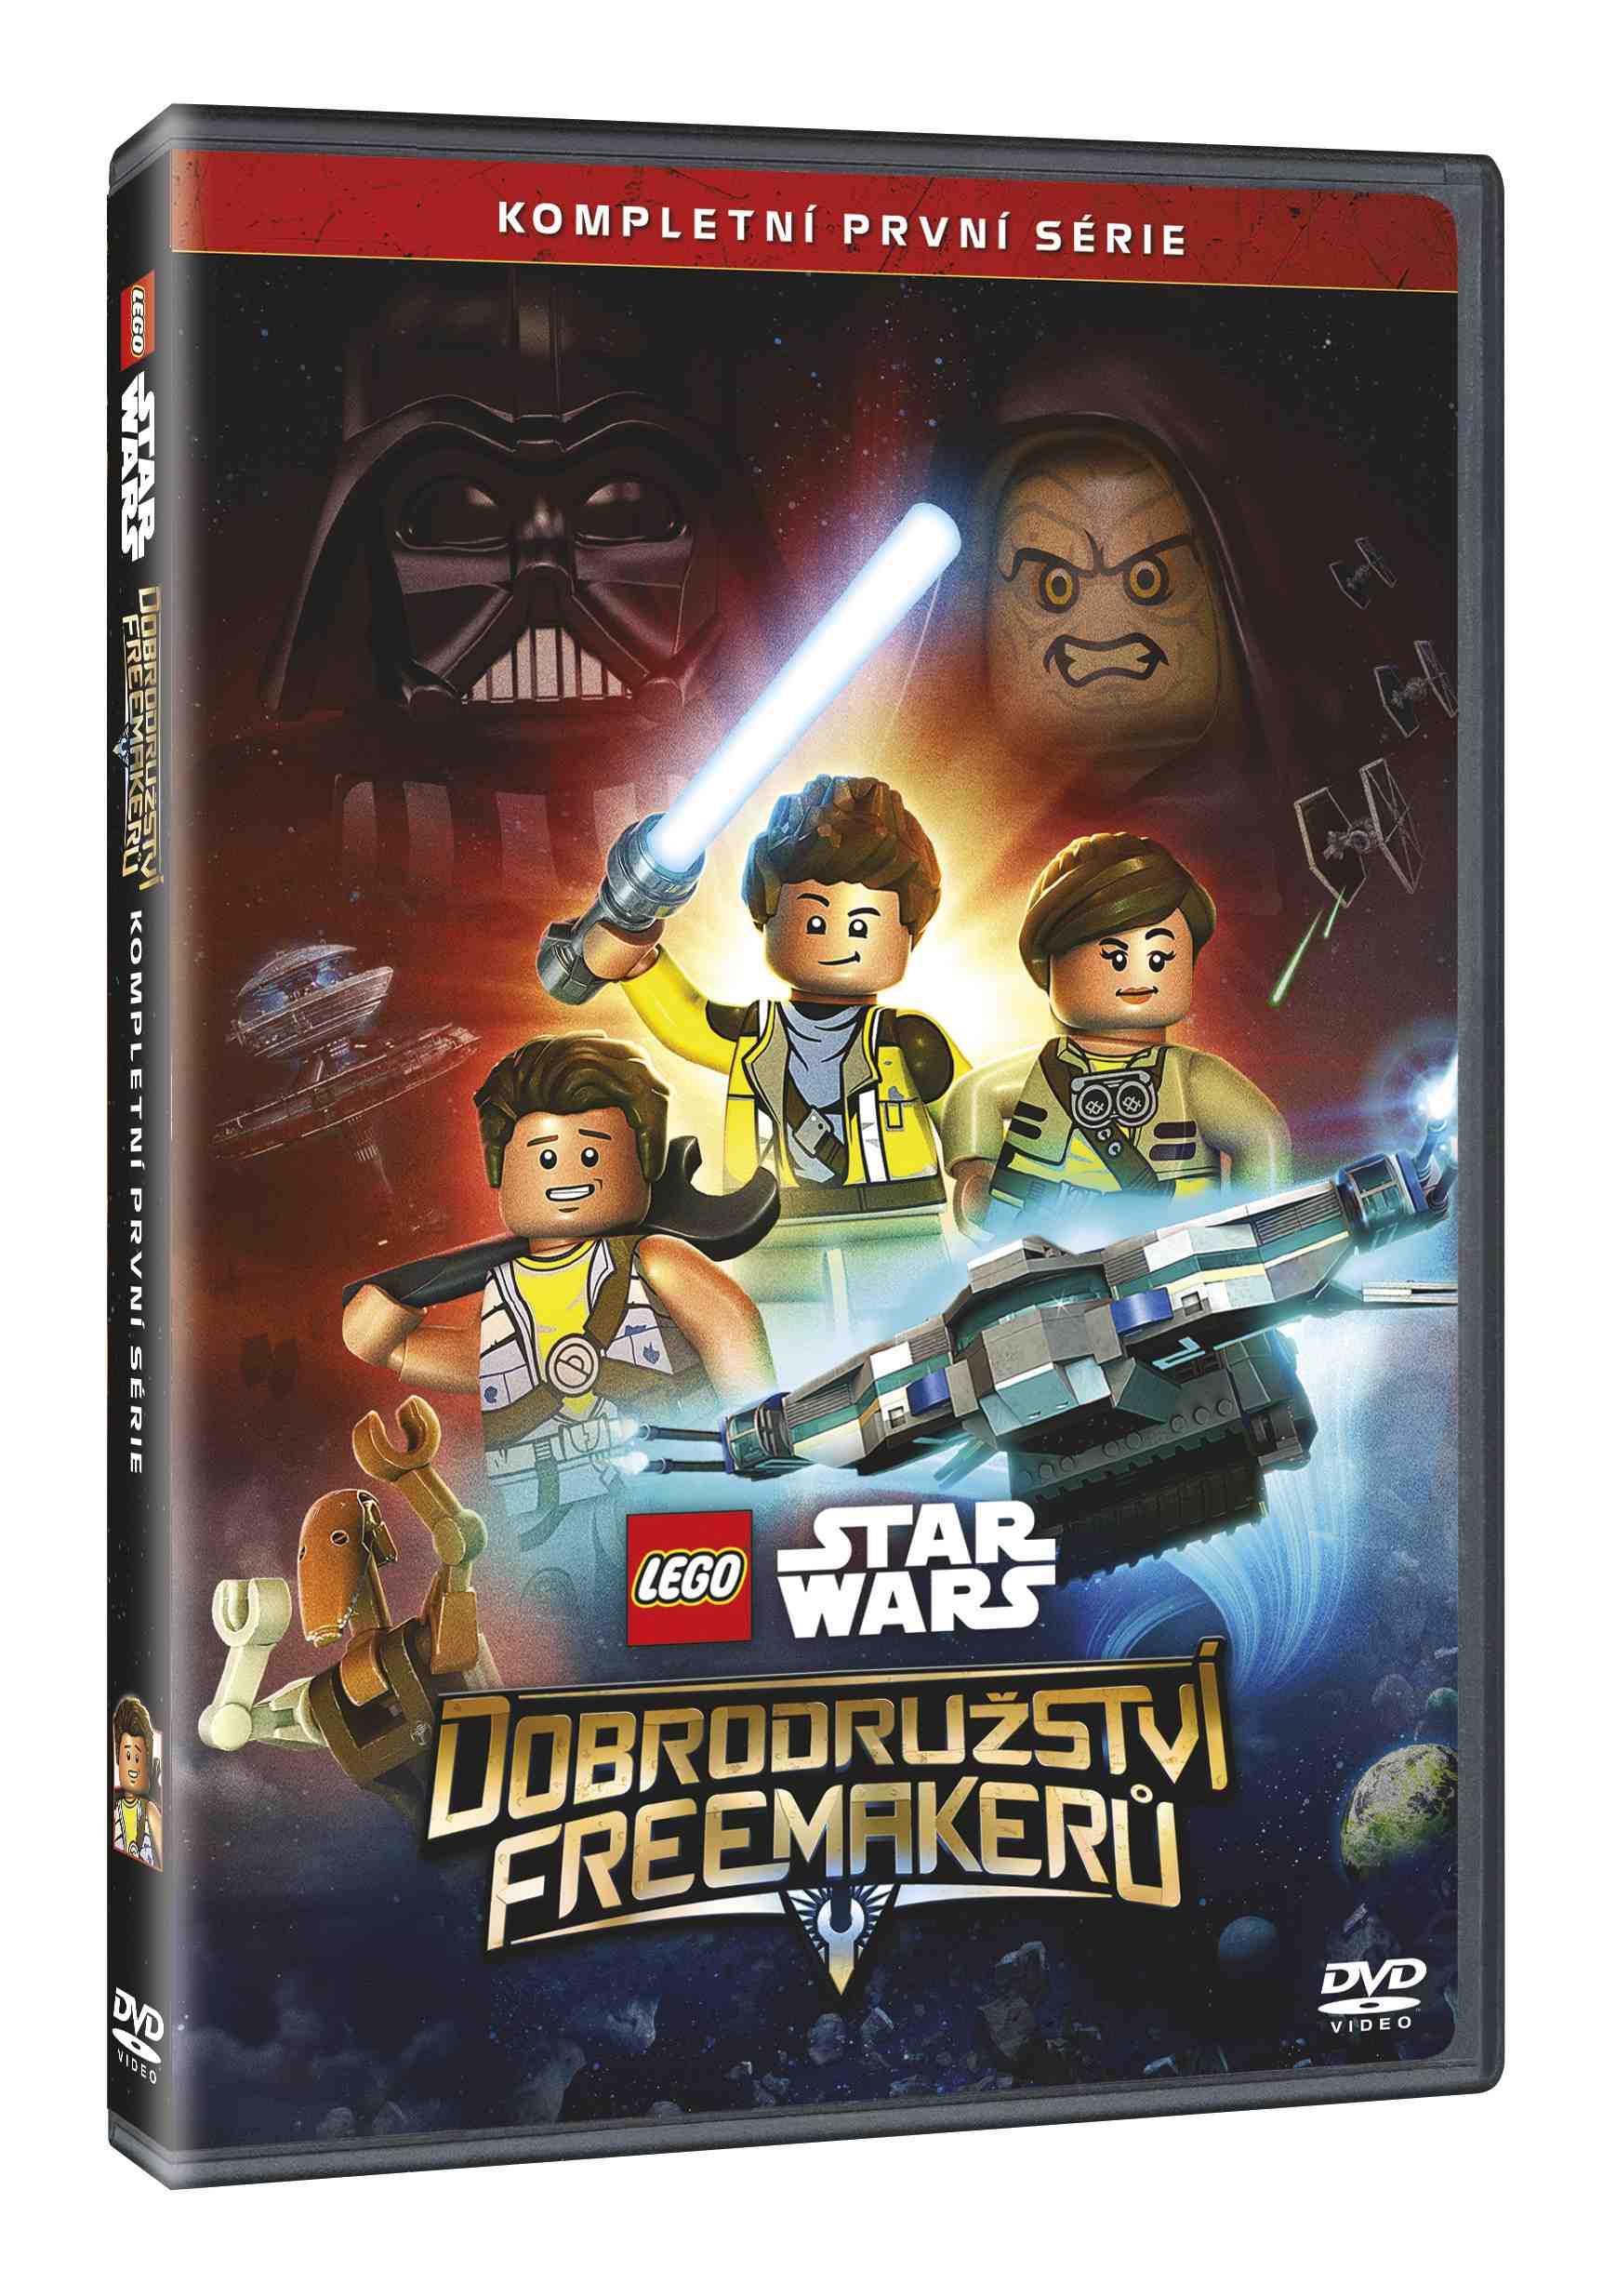 LEGO STAR WARS: DOBRODRUŽSTVÍ FREEMAKERŮ 1. SÉRIE - 2 DVD